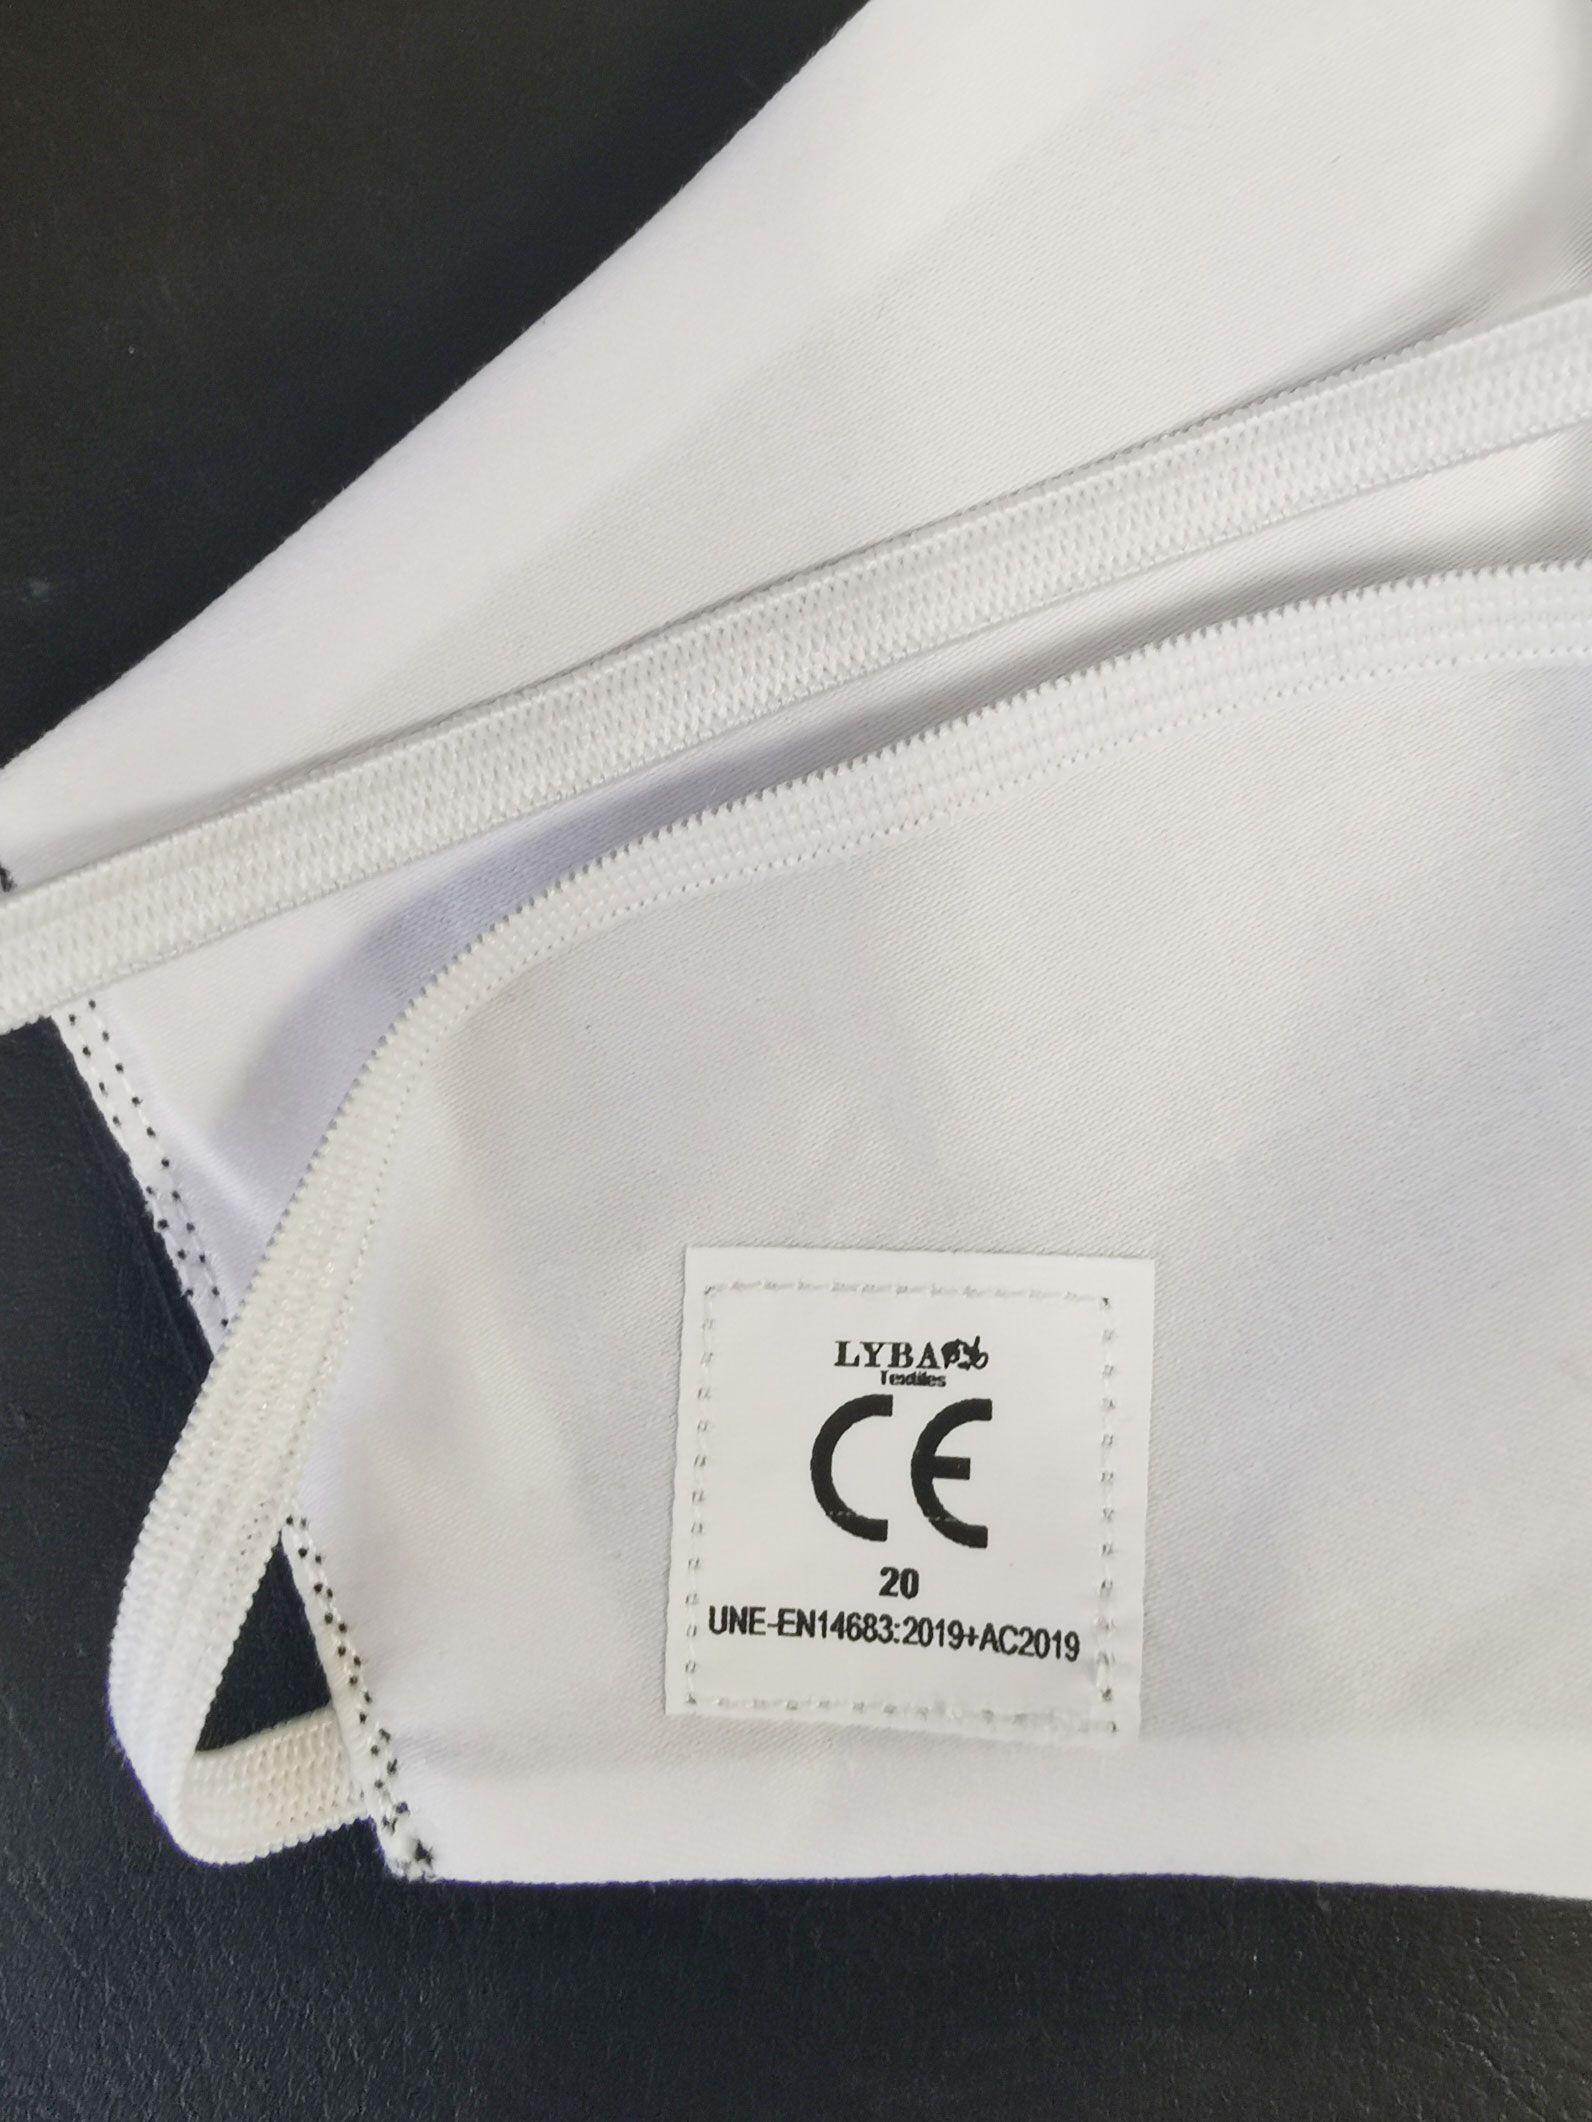 Fotografia Mascarillas sanitarias reutilizables de Lyba Textiles con